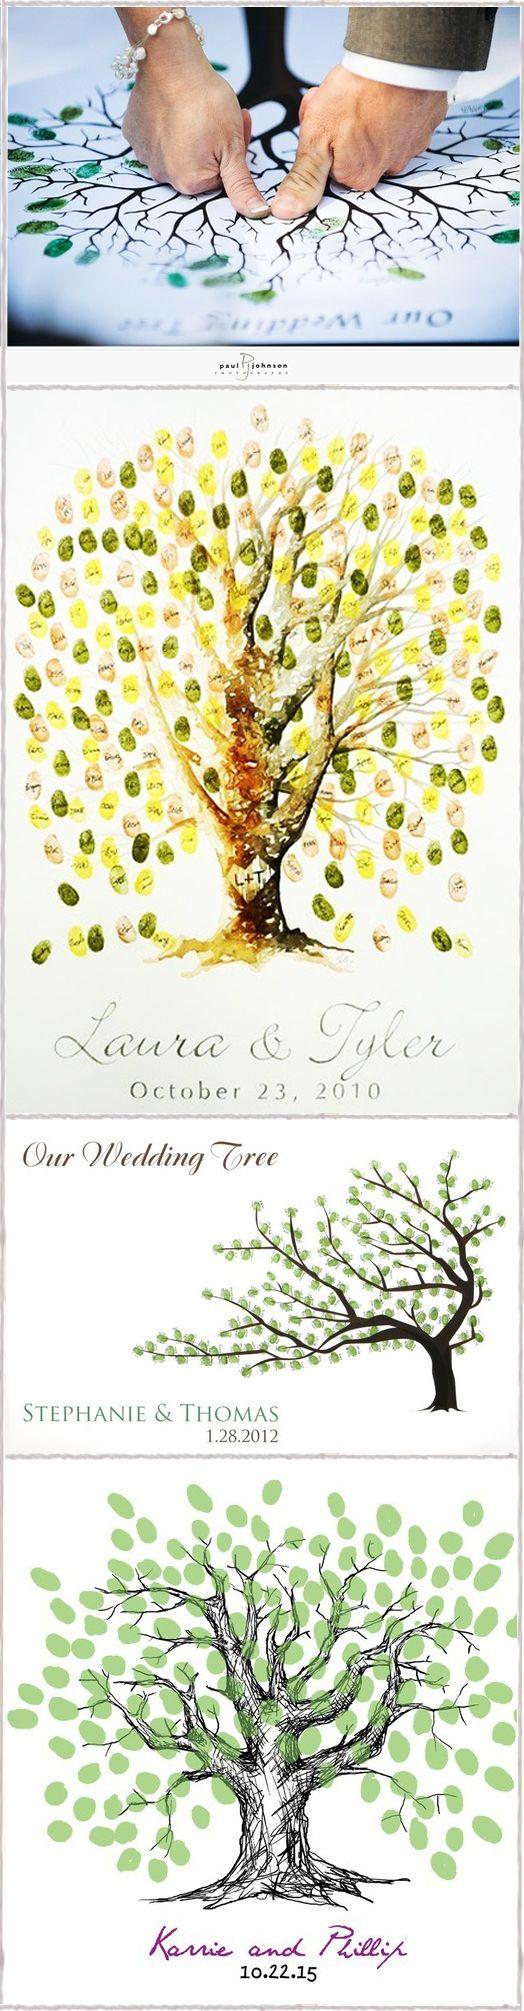 Wedding tree with guests\' fingerprints | Wedding ideas | Pinterest ...